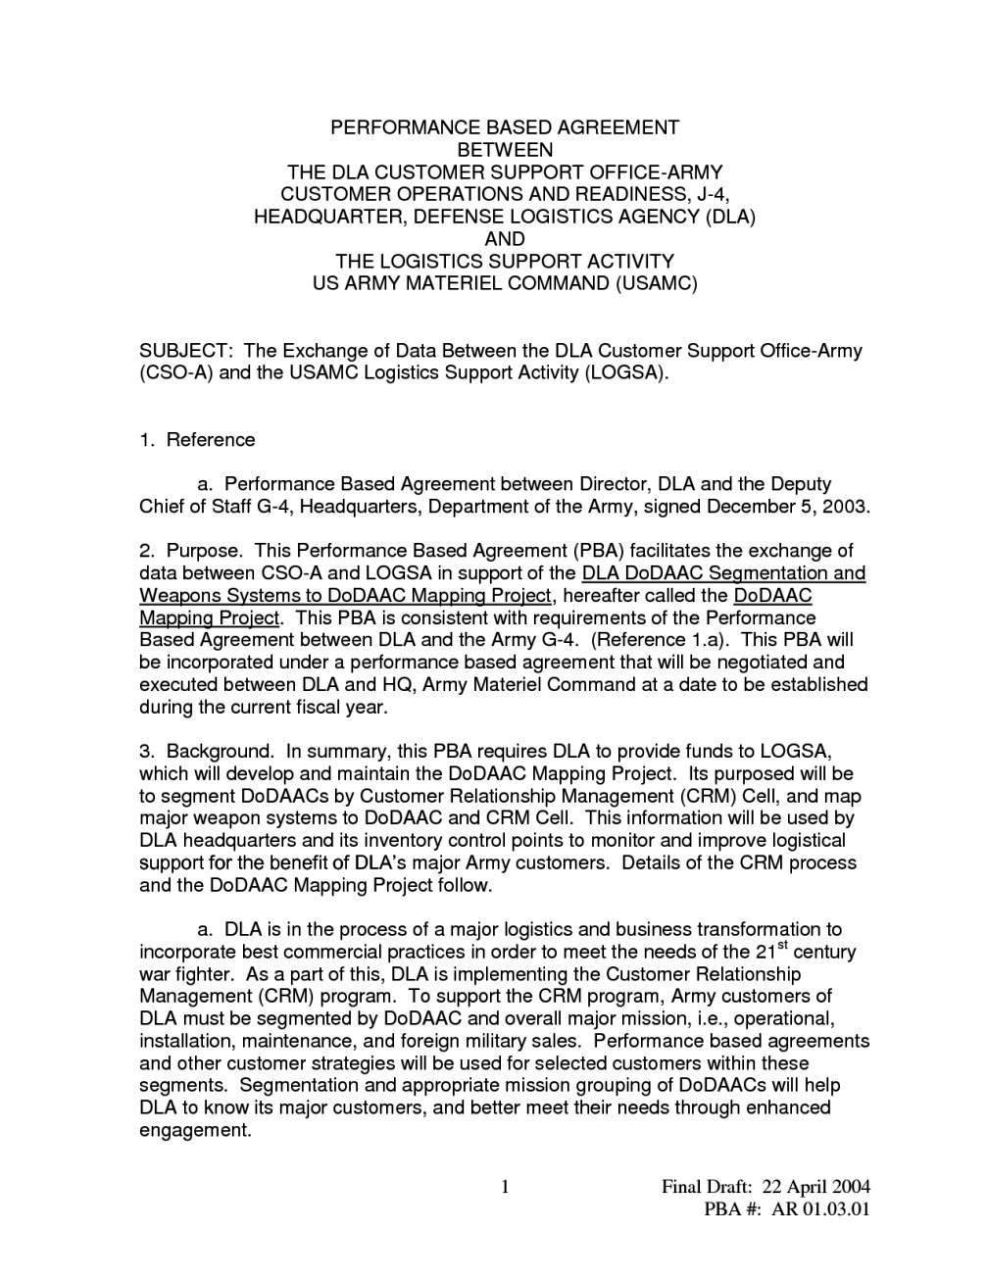 memorandum of agreement template army